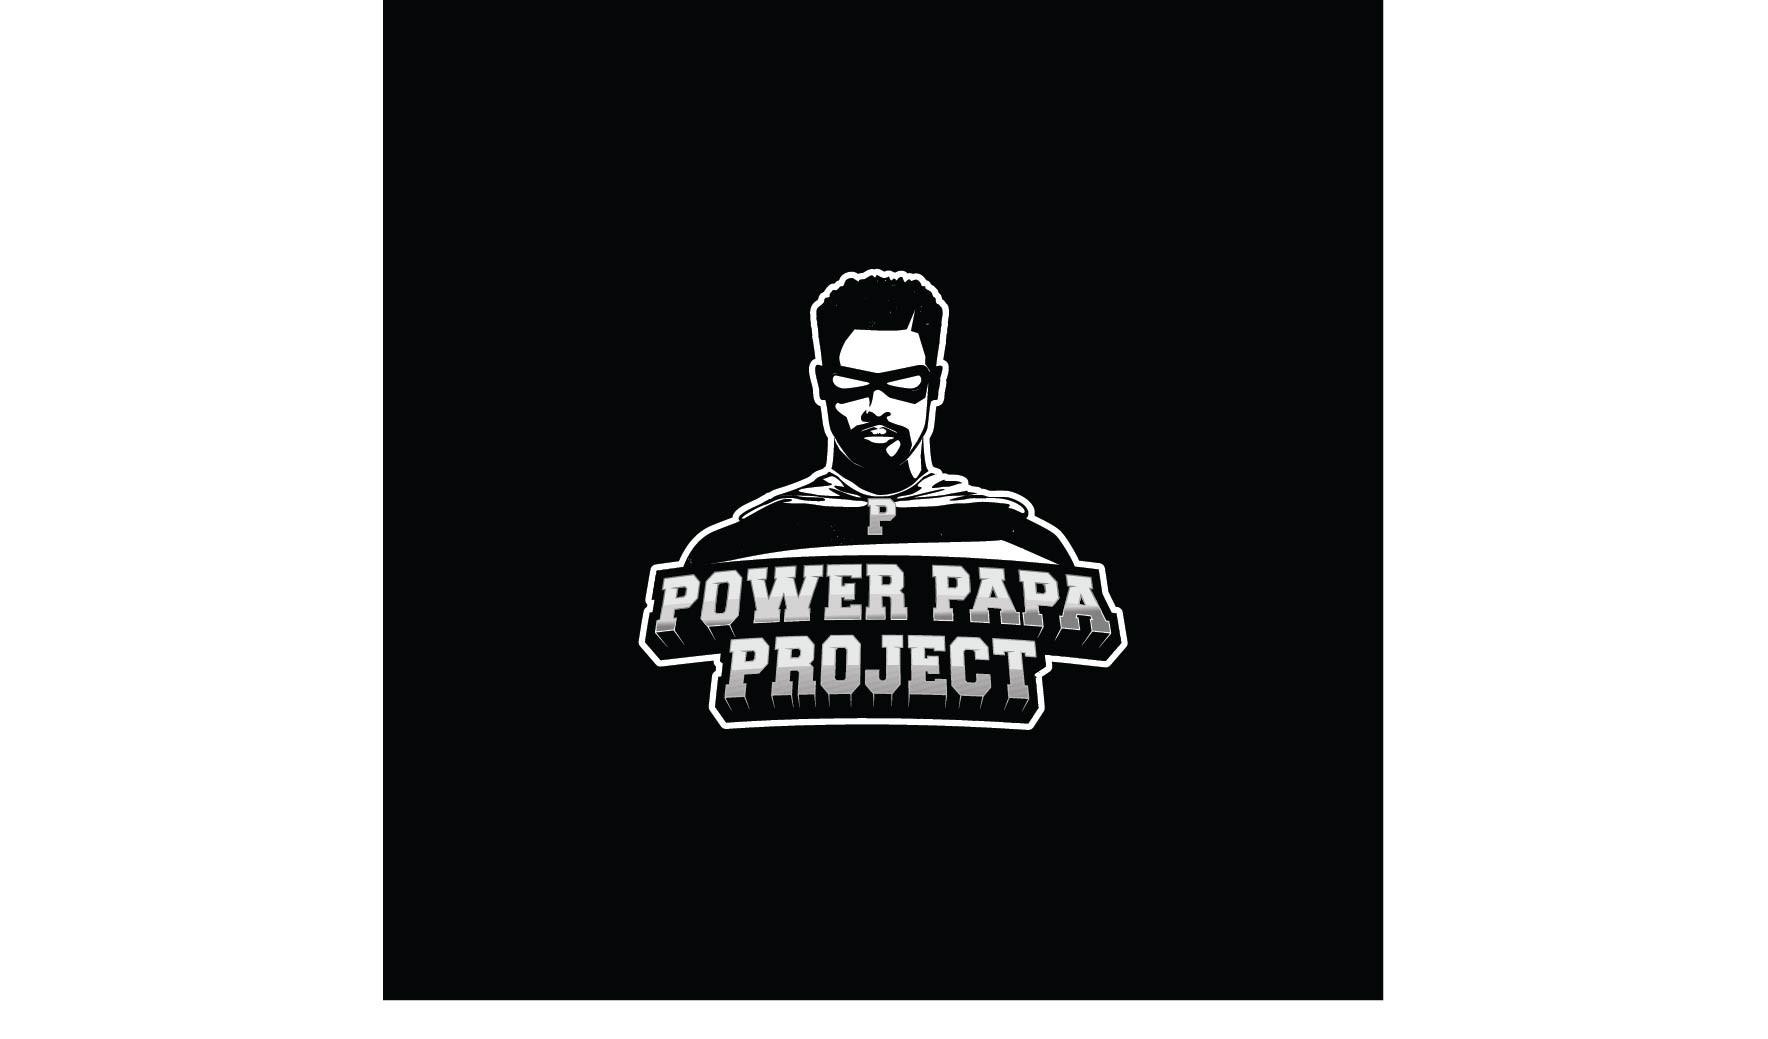 Power Papa Project - A Blog needs a Logo & Social Media Design